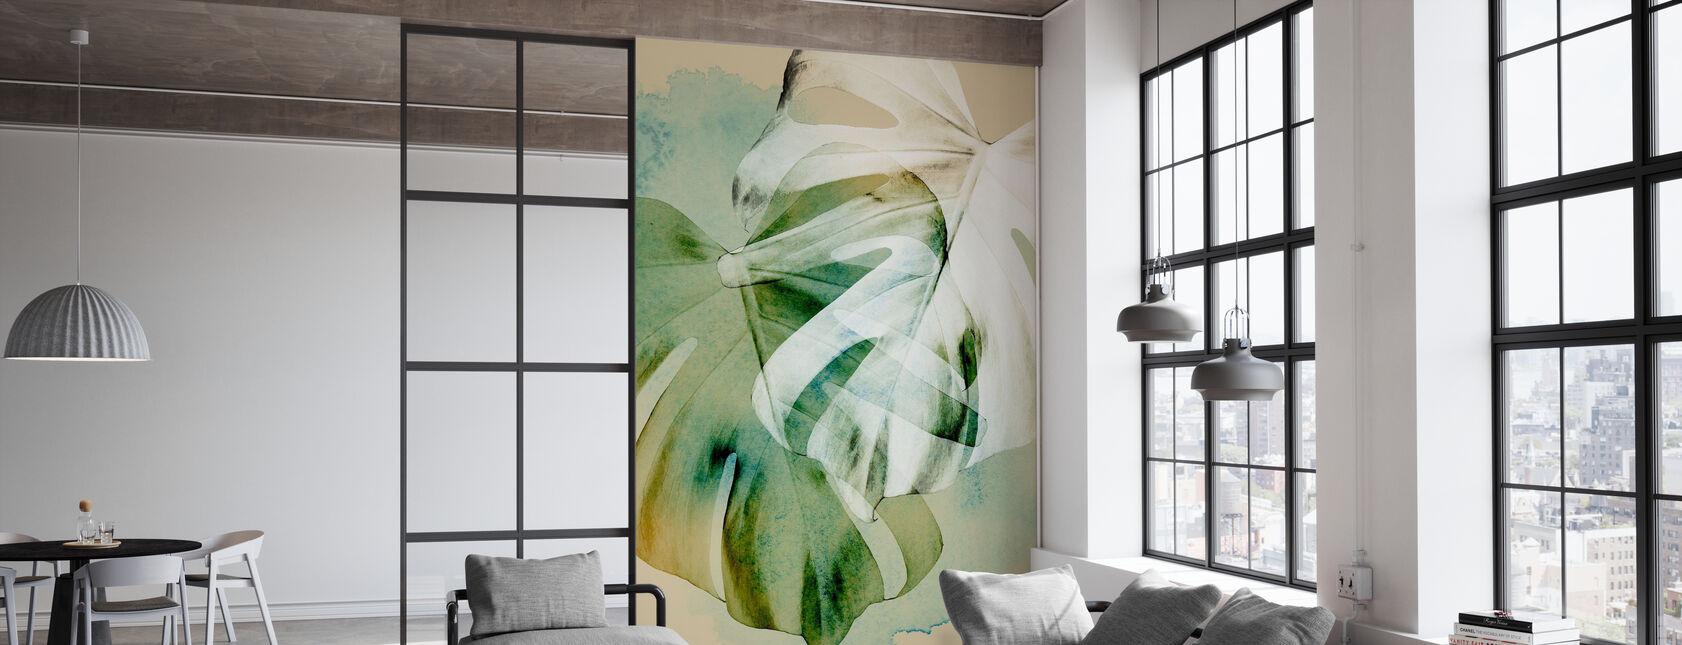 Monstera Leaf - Wallpaper - Office